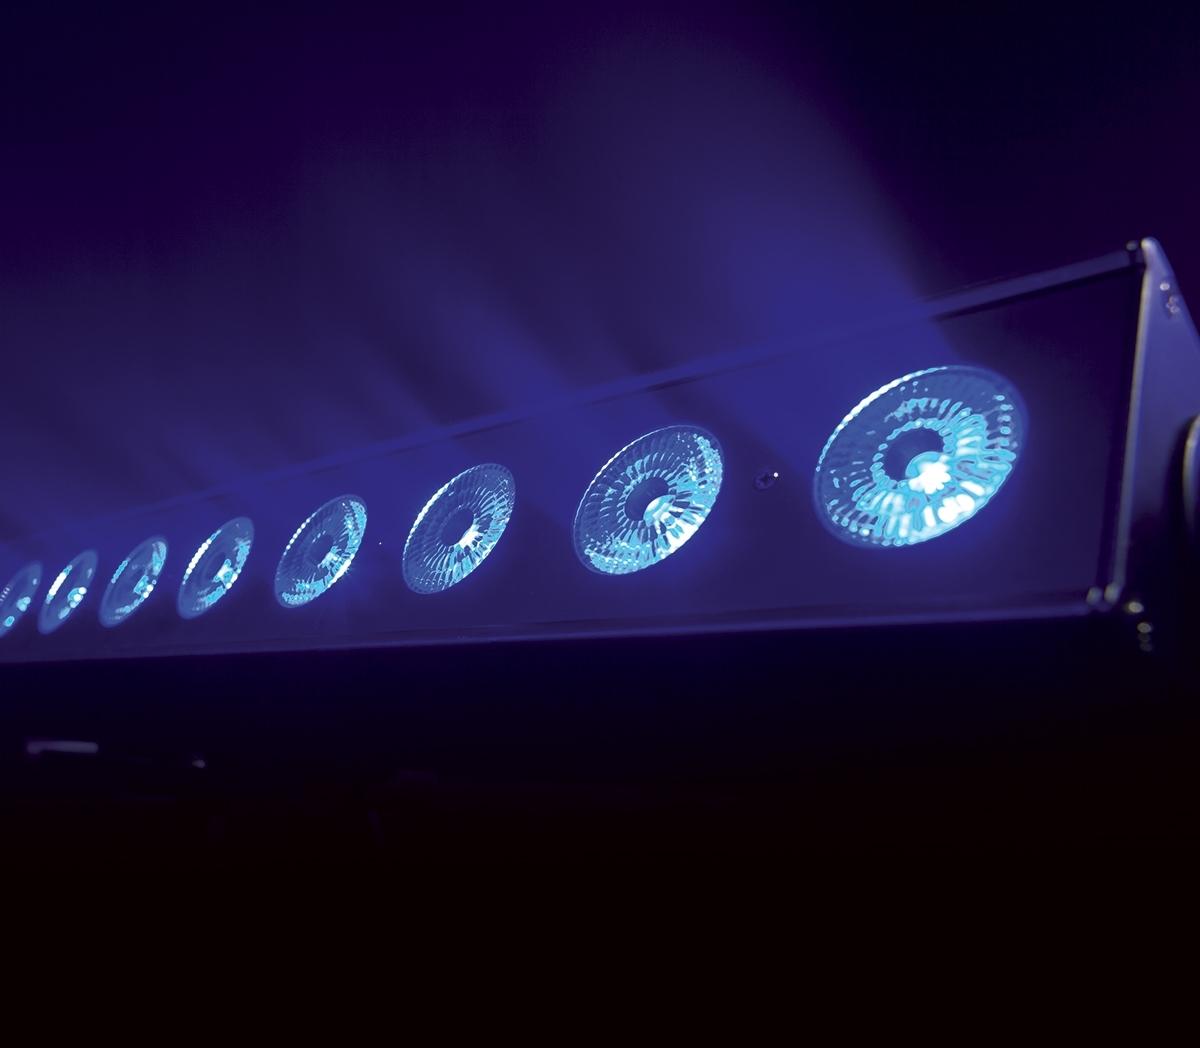 Sagitter SG ACLBAR10 - Линейный светильник 10 x 15 Вт RGBW LED